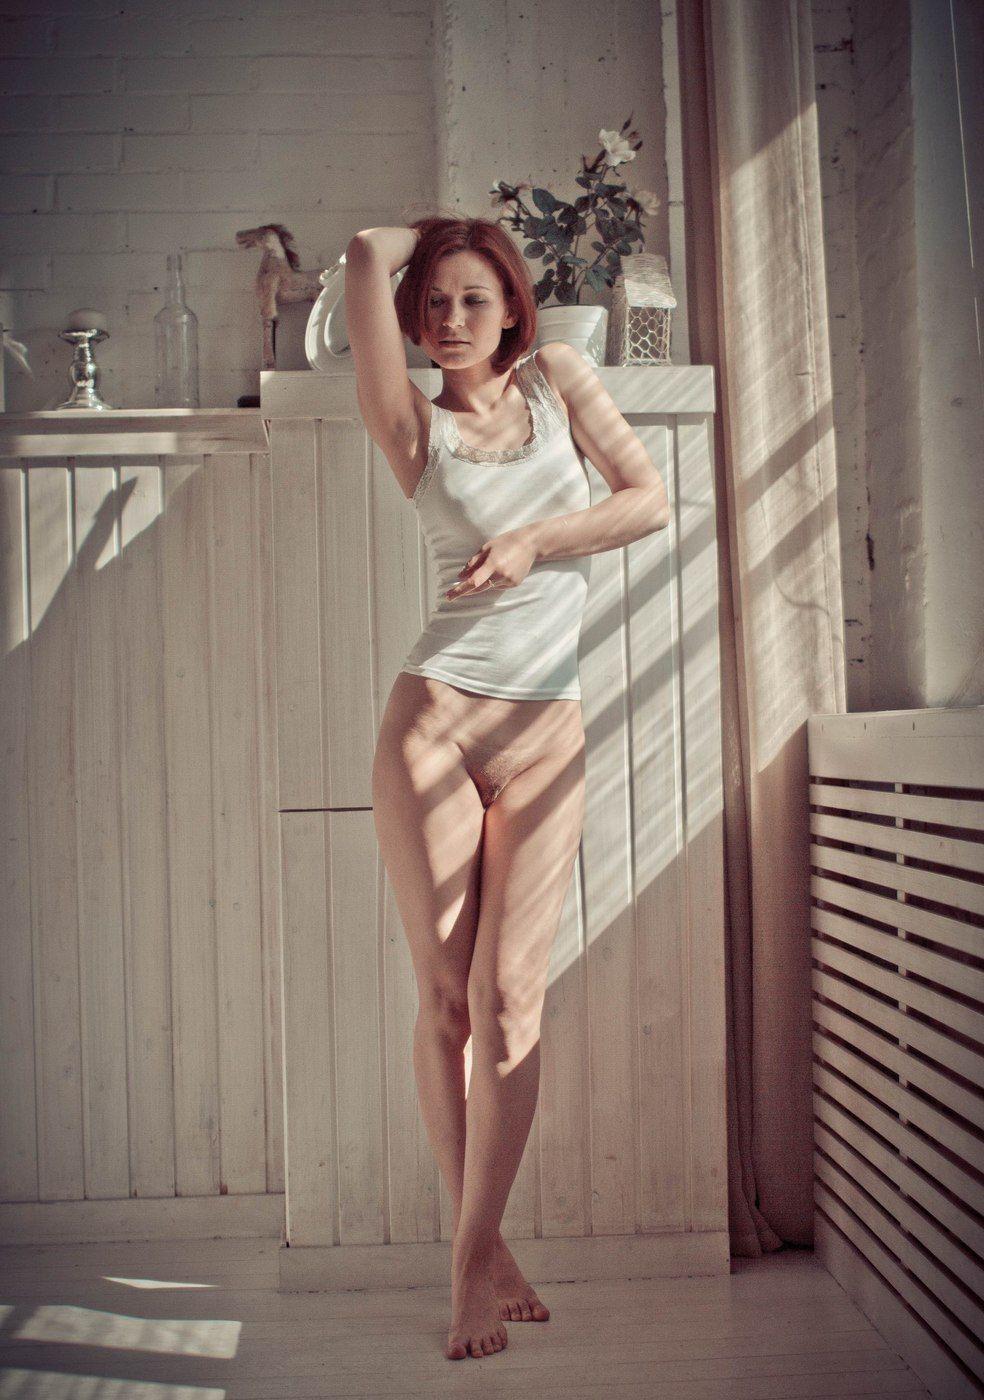 Супер сексуальная голая девочка киска